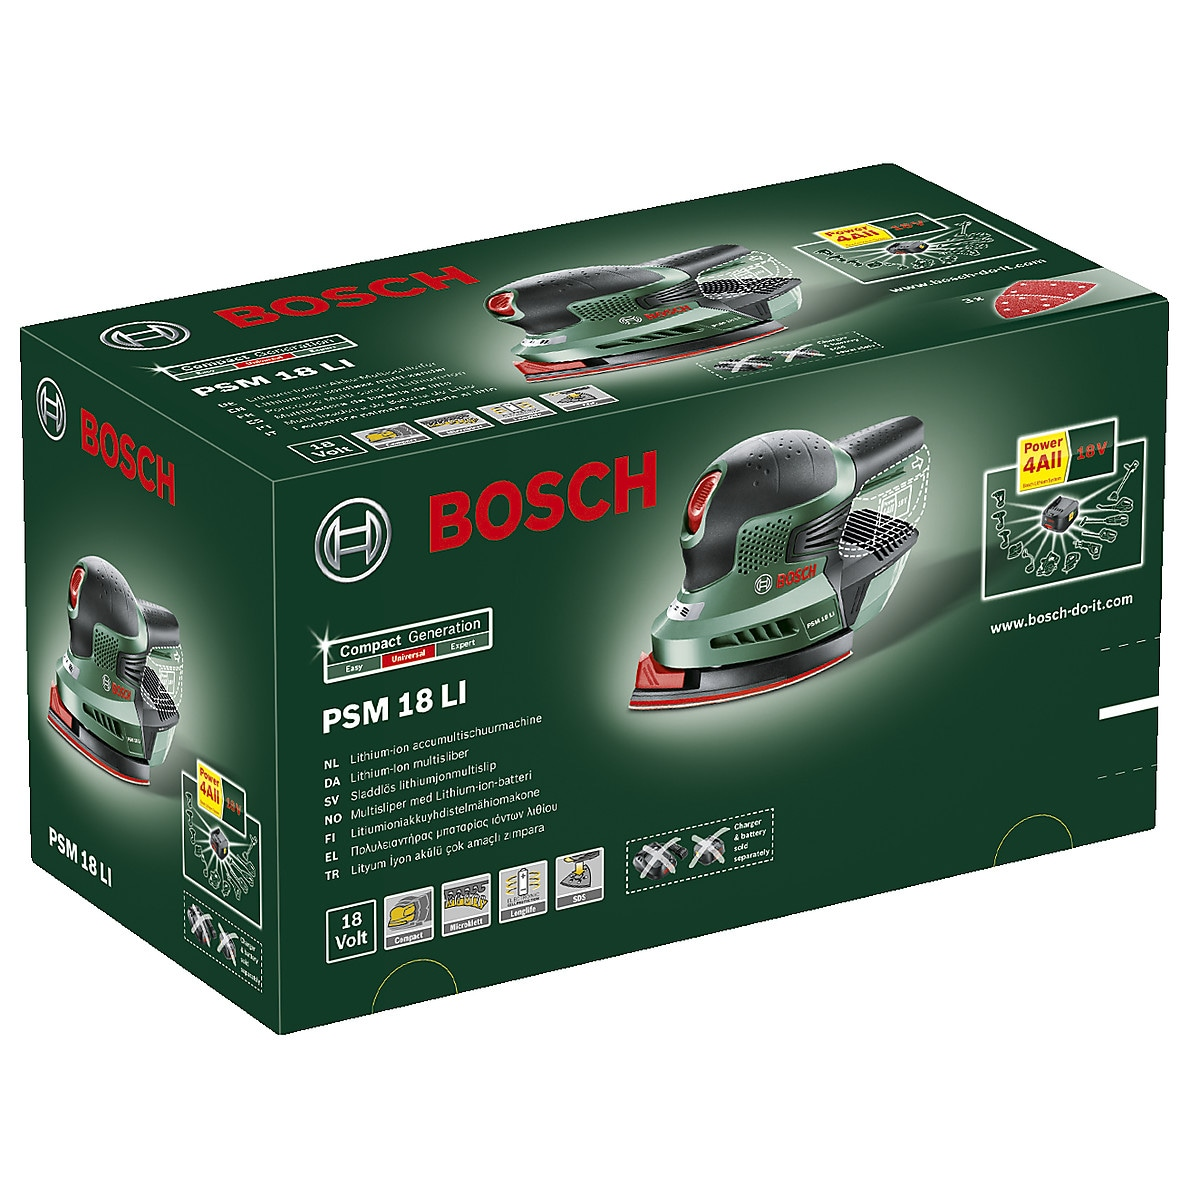 Multislip Bosch PSM 18 LI